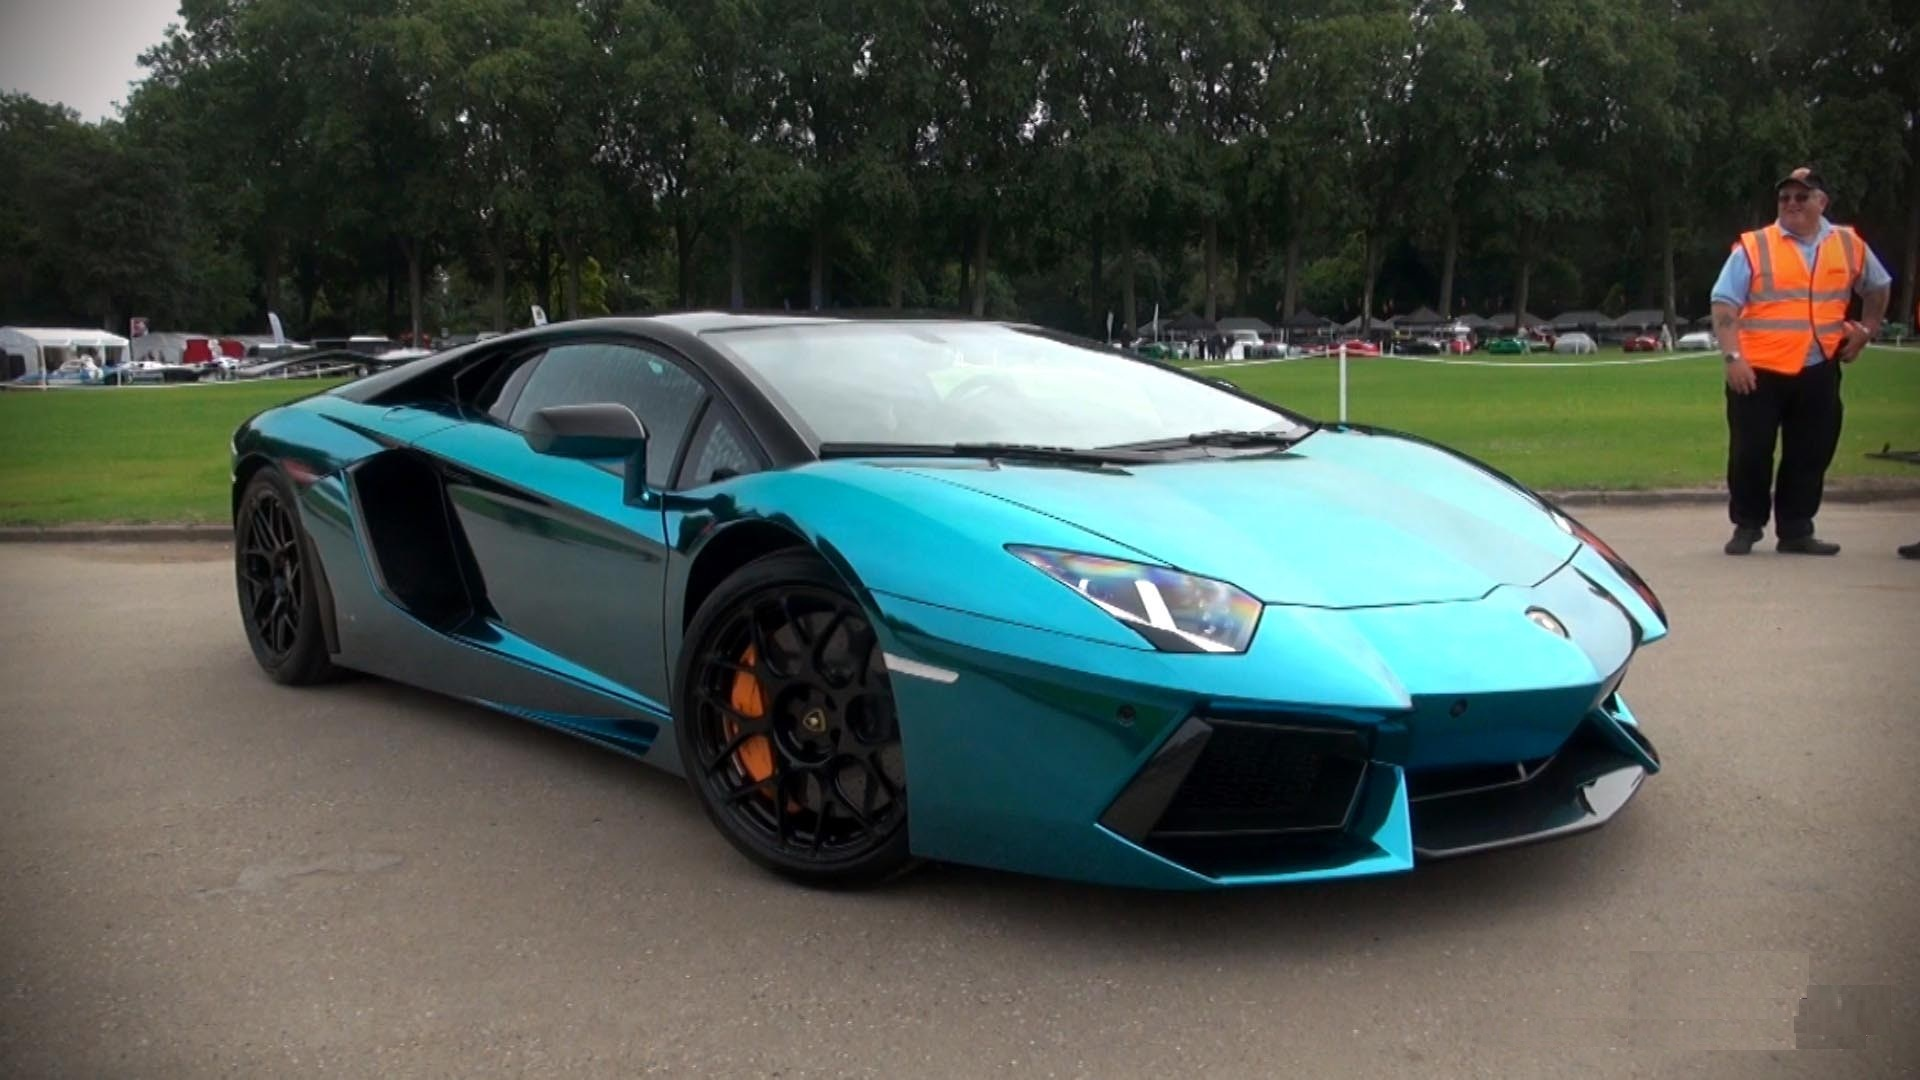 Download Wallpaper Hd 1080p Lamborghini Aventador Wallpaper 1080p Hd